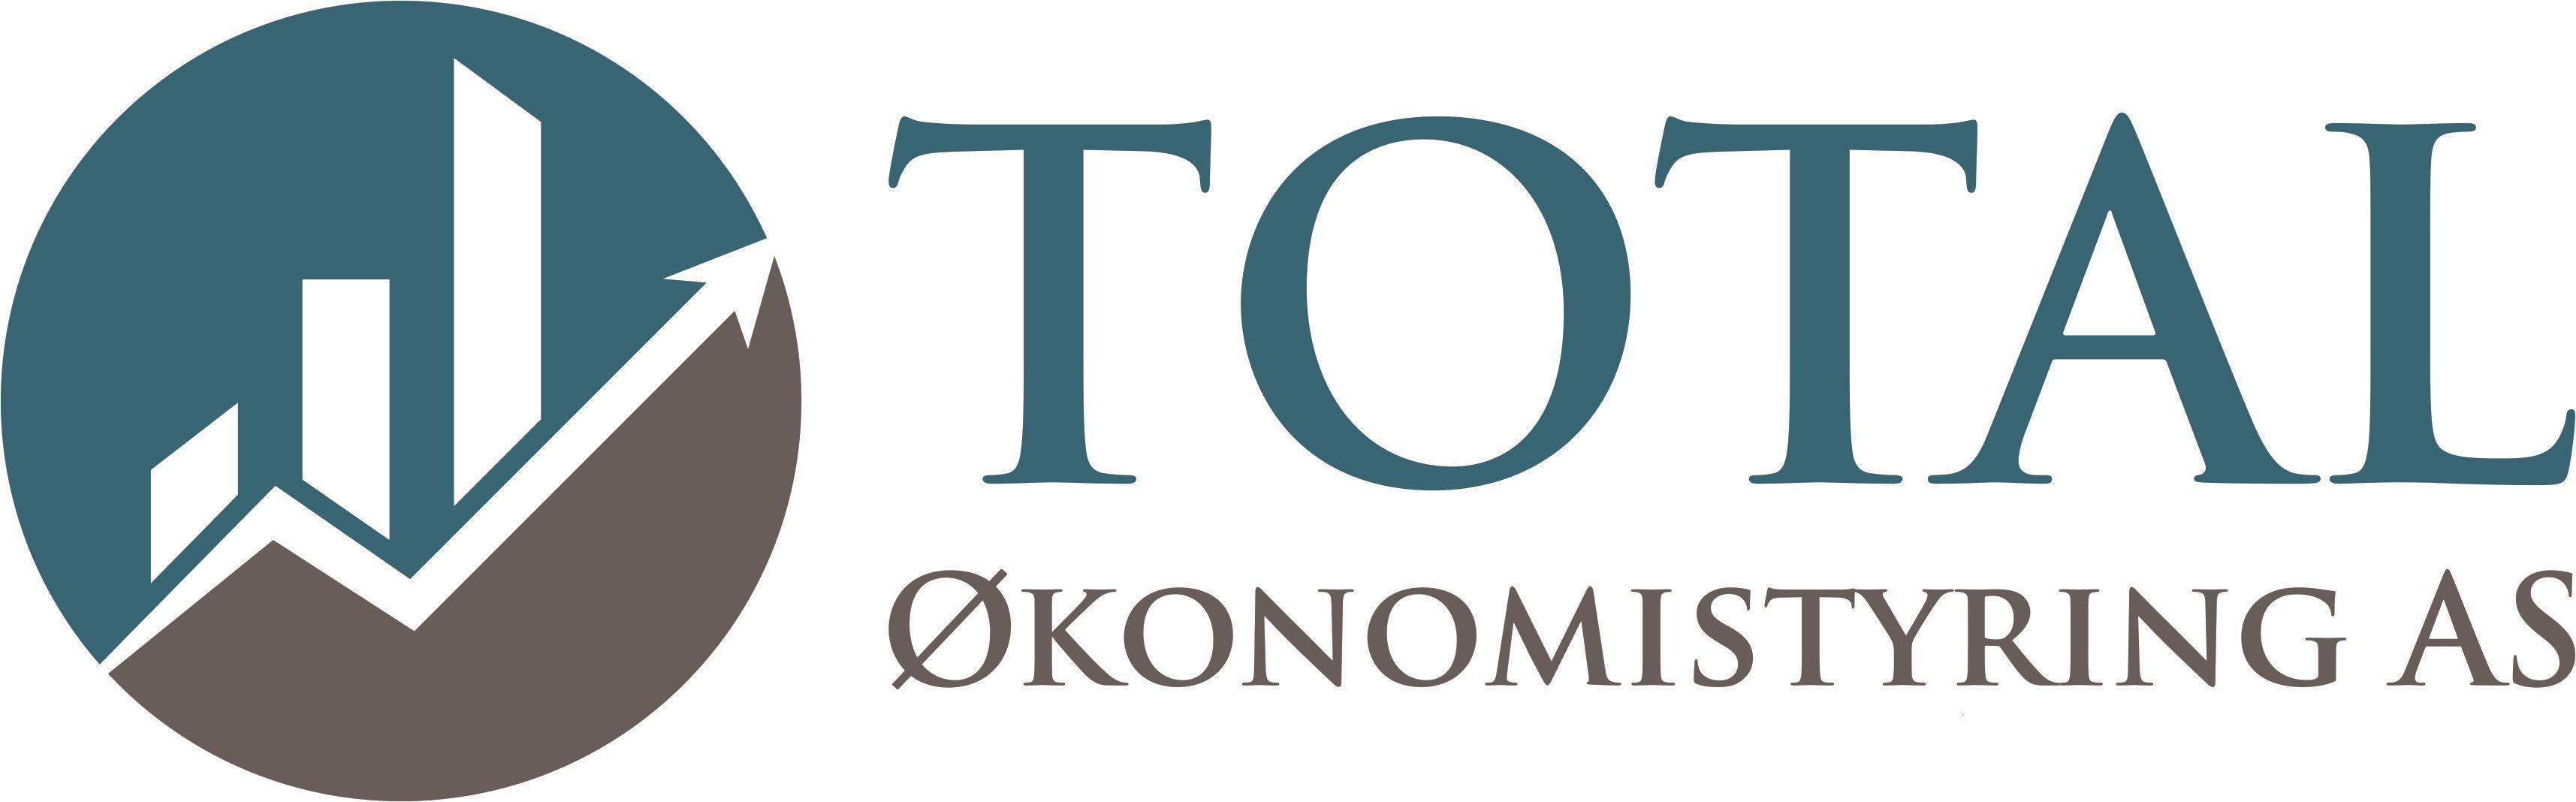 Total Økonomistyring AS logo